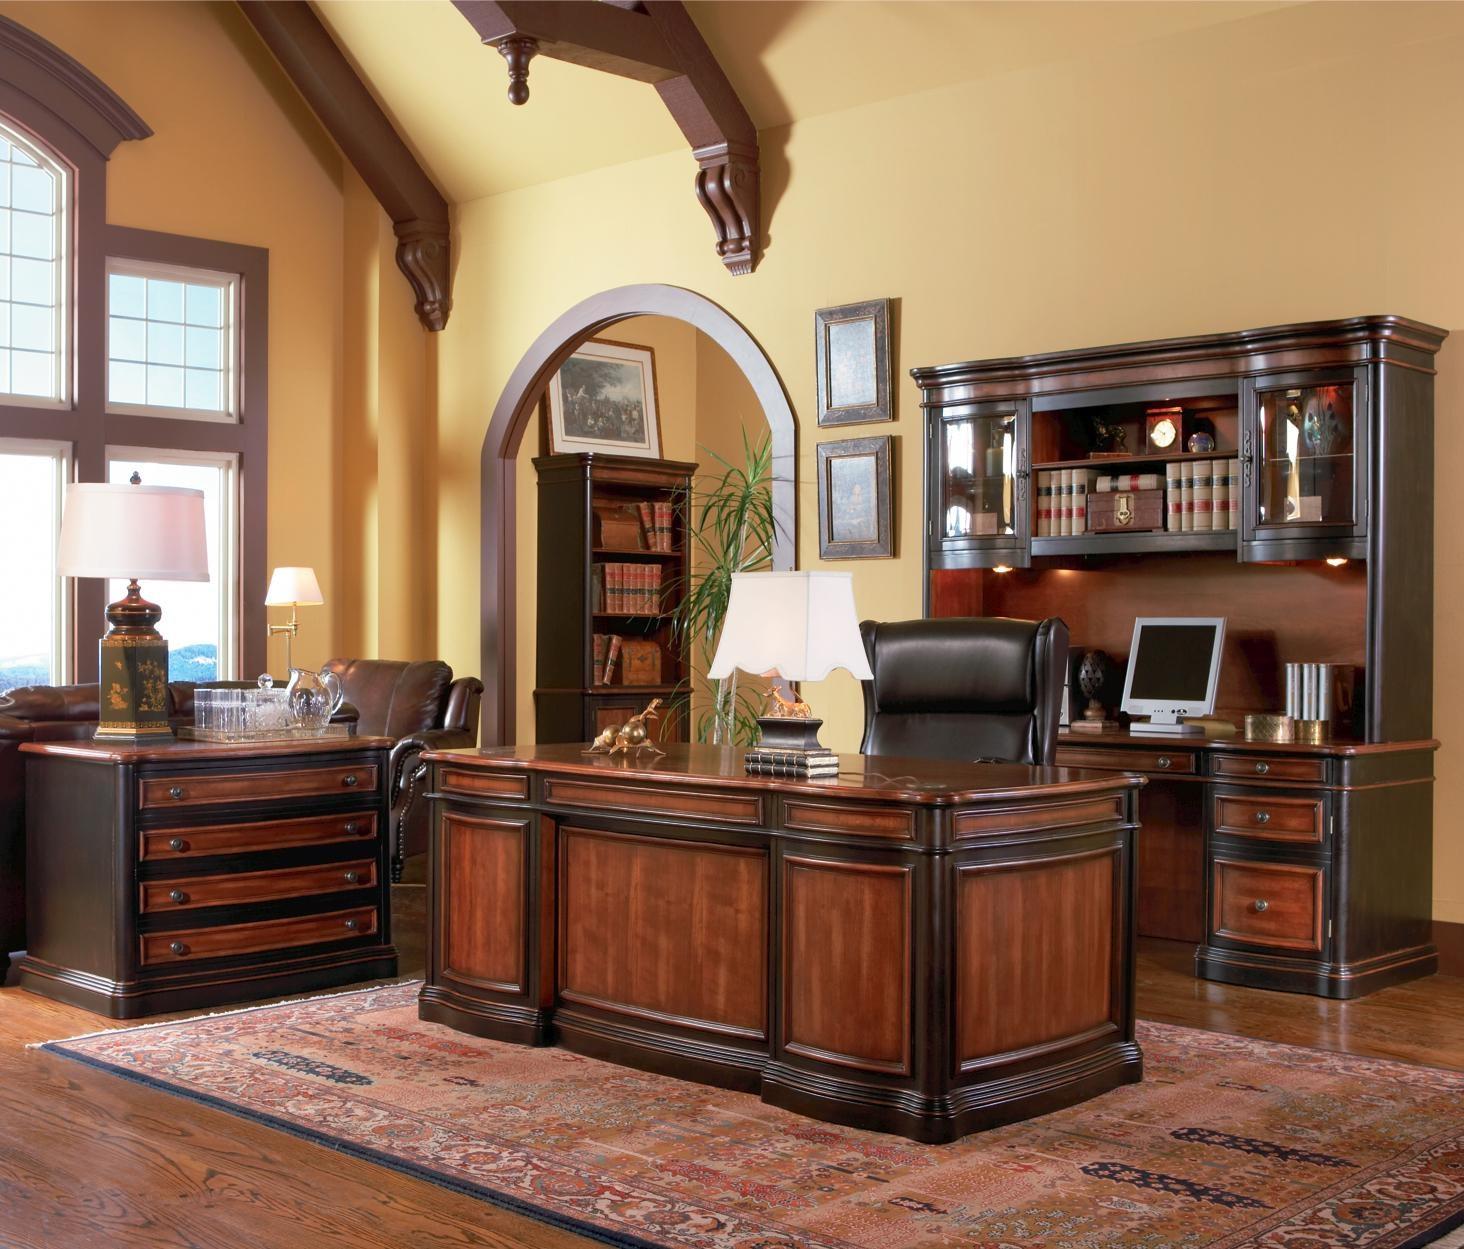 Coaster Home fice Credenza The Furniture House